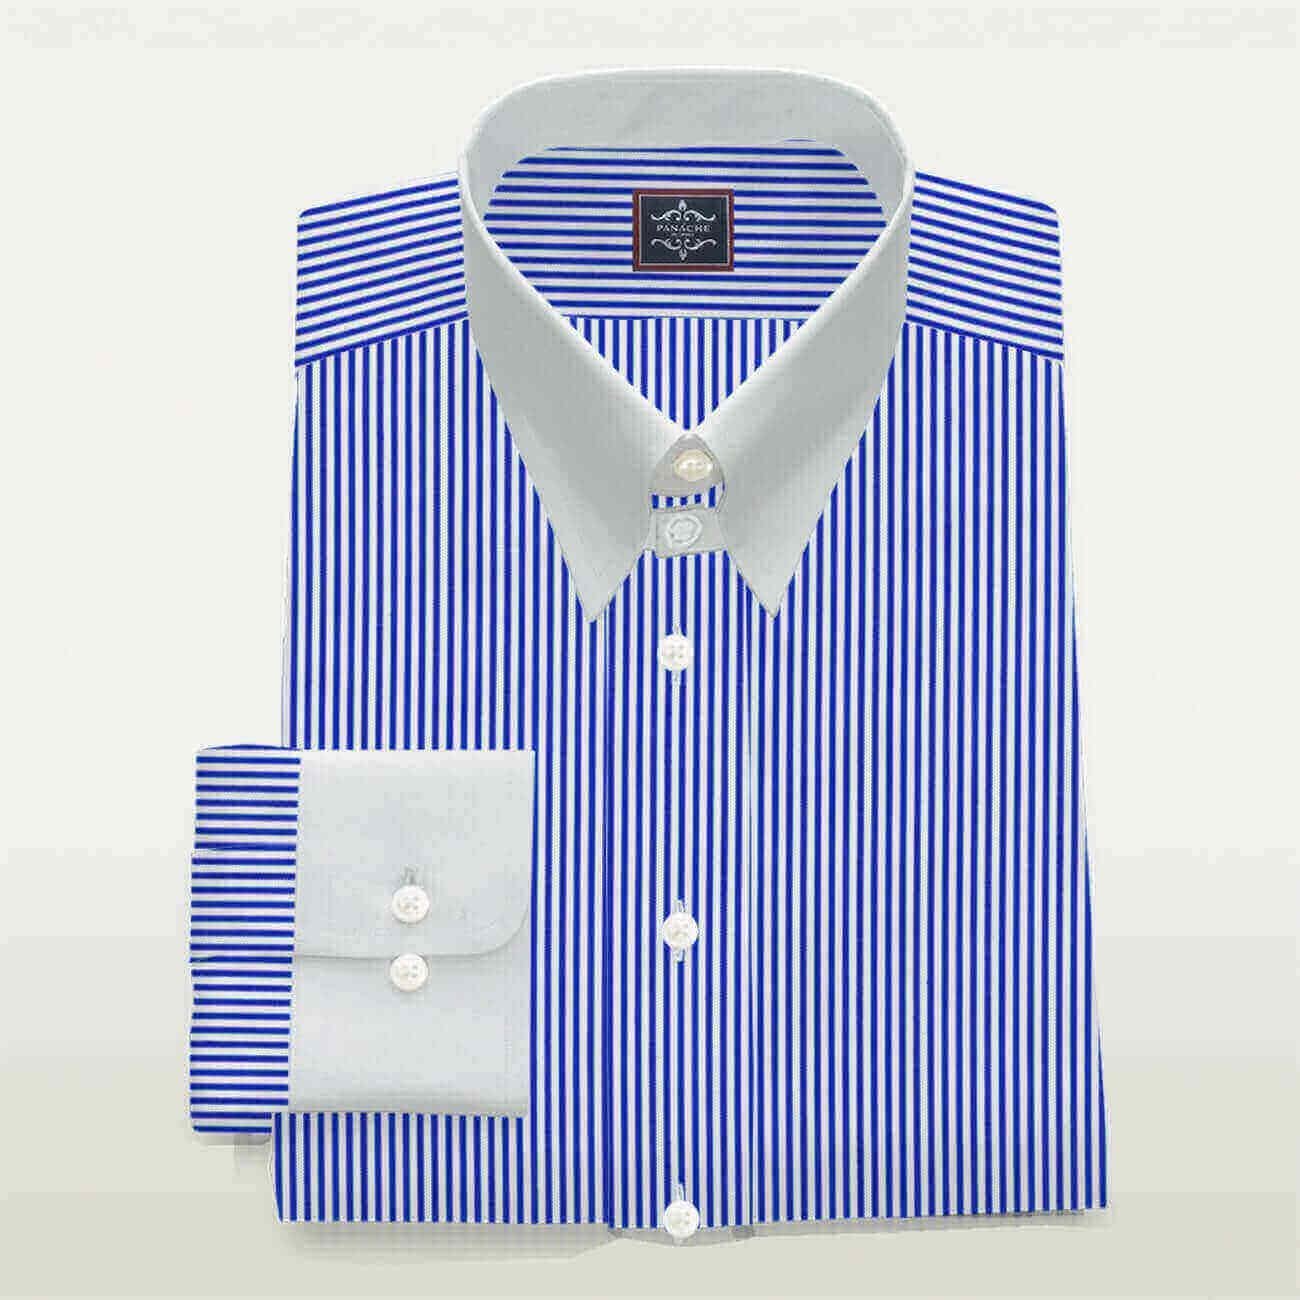 Luxury White and Blue Tab Collar Stripes Shirt